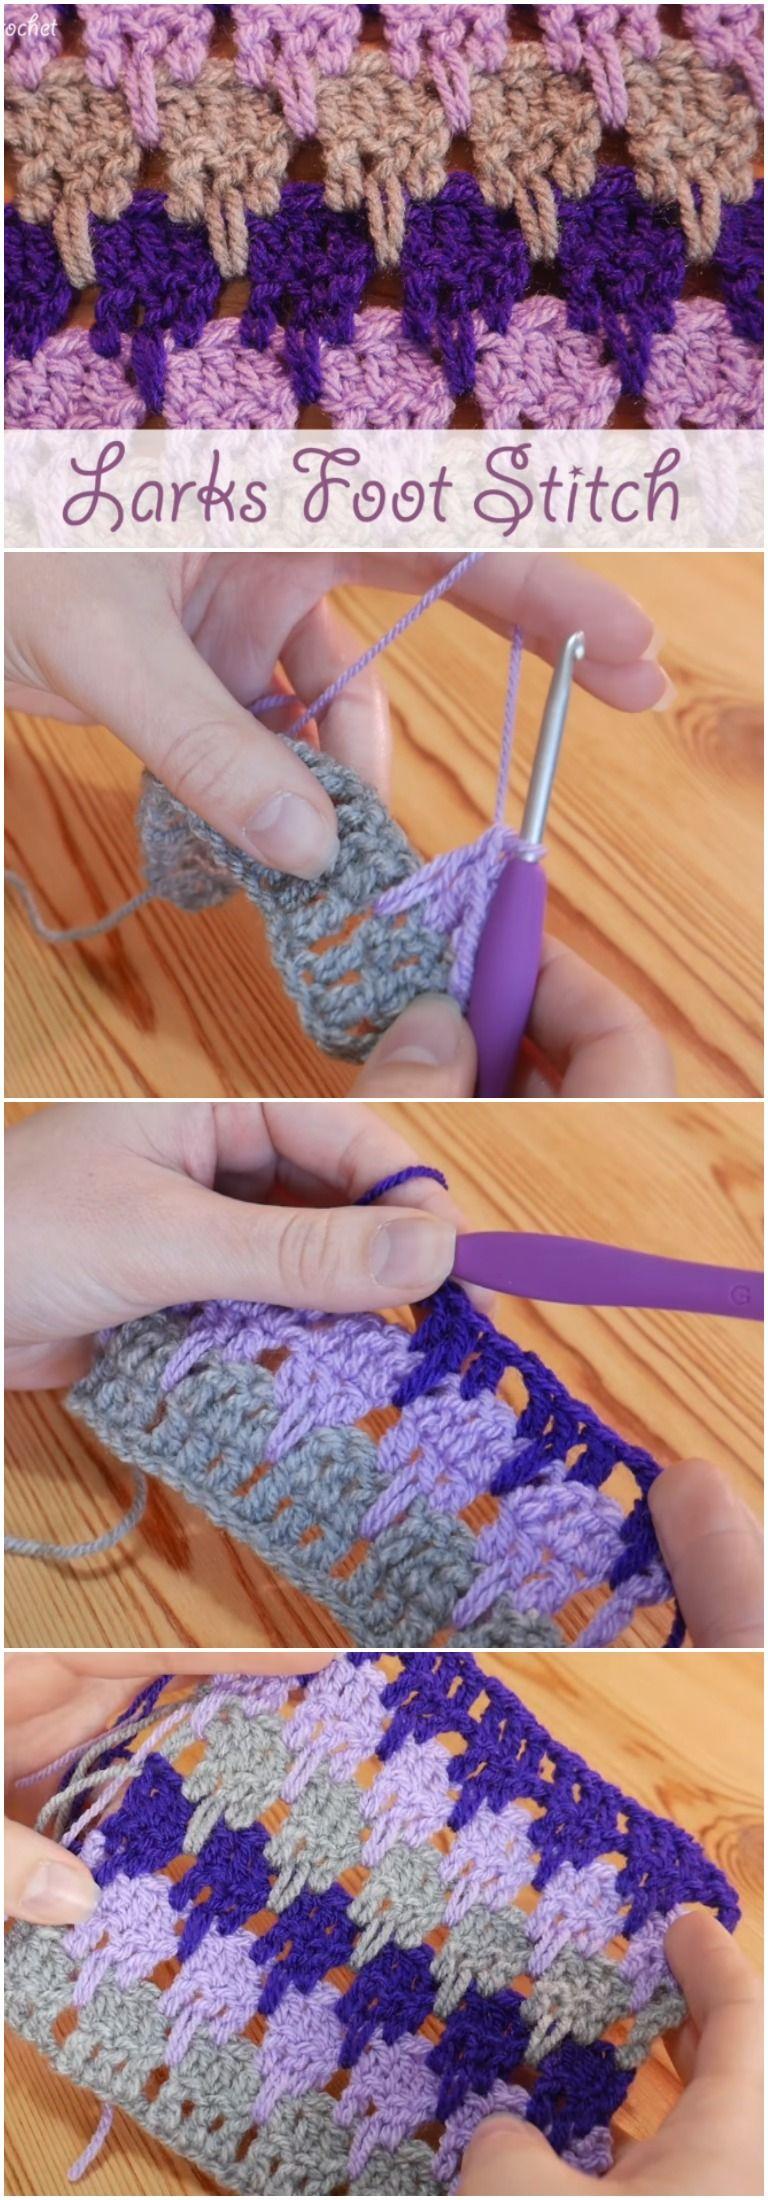 Crochet Larks Foot Stitch Ideal For Scarves Blankets Crochet